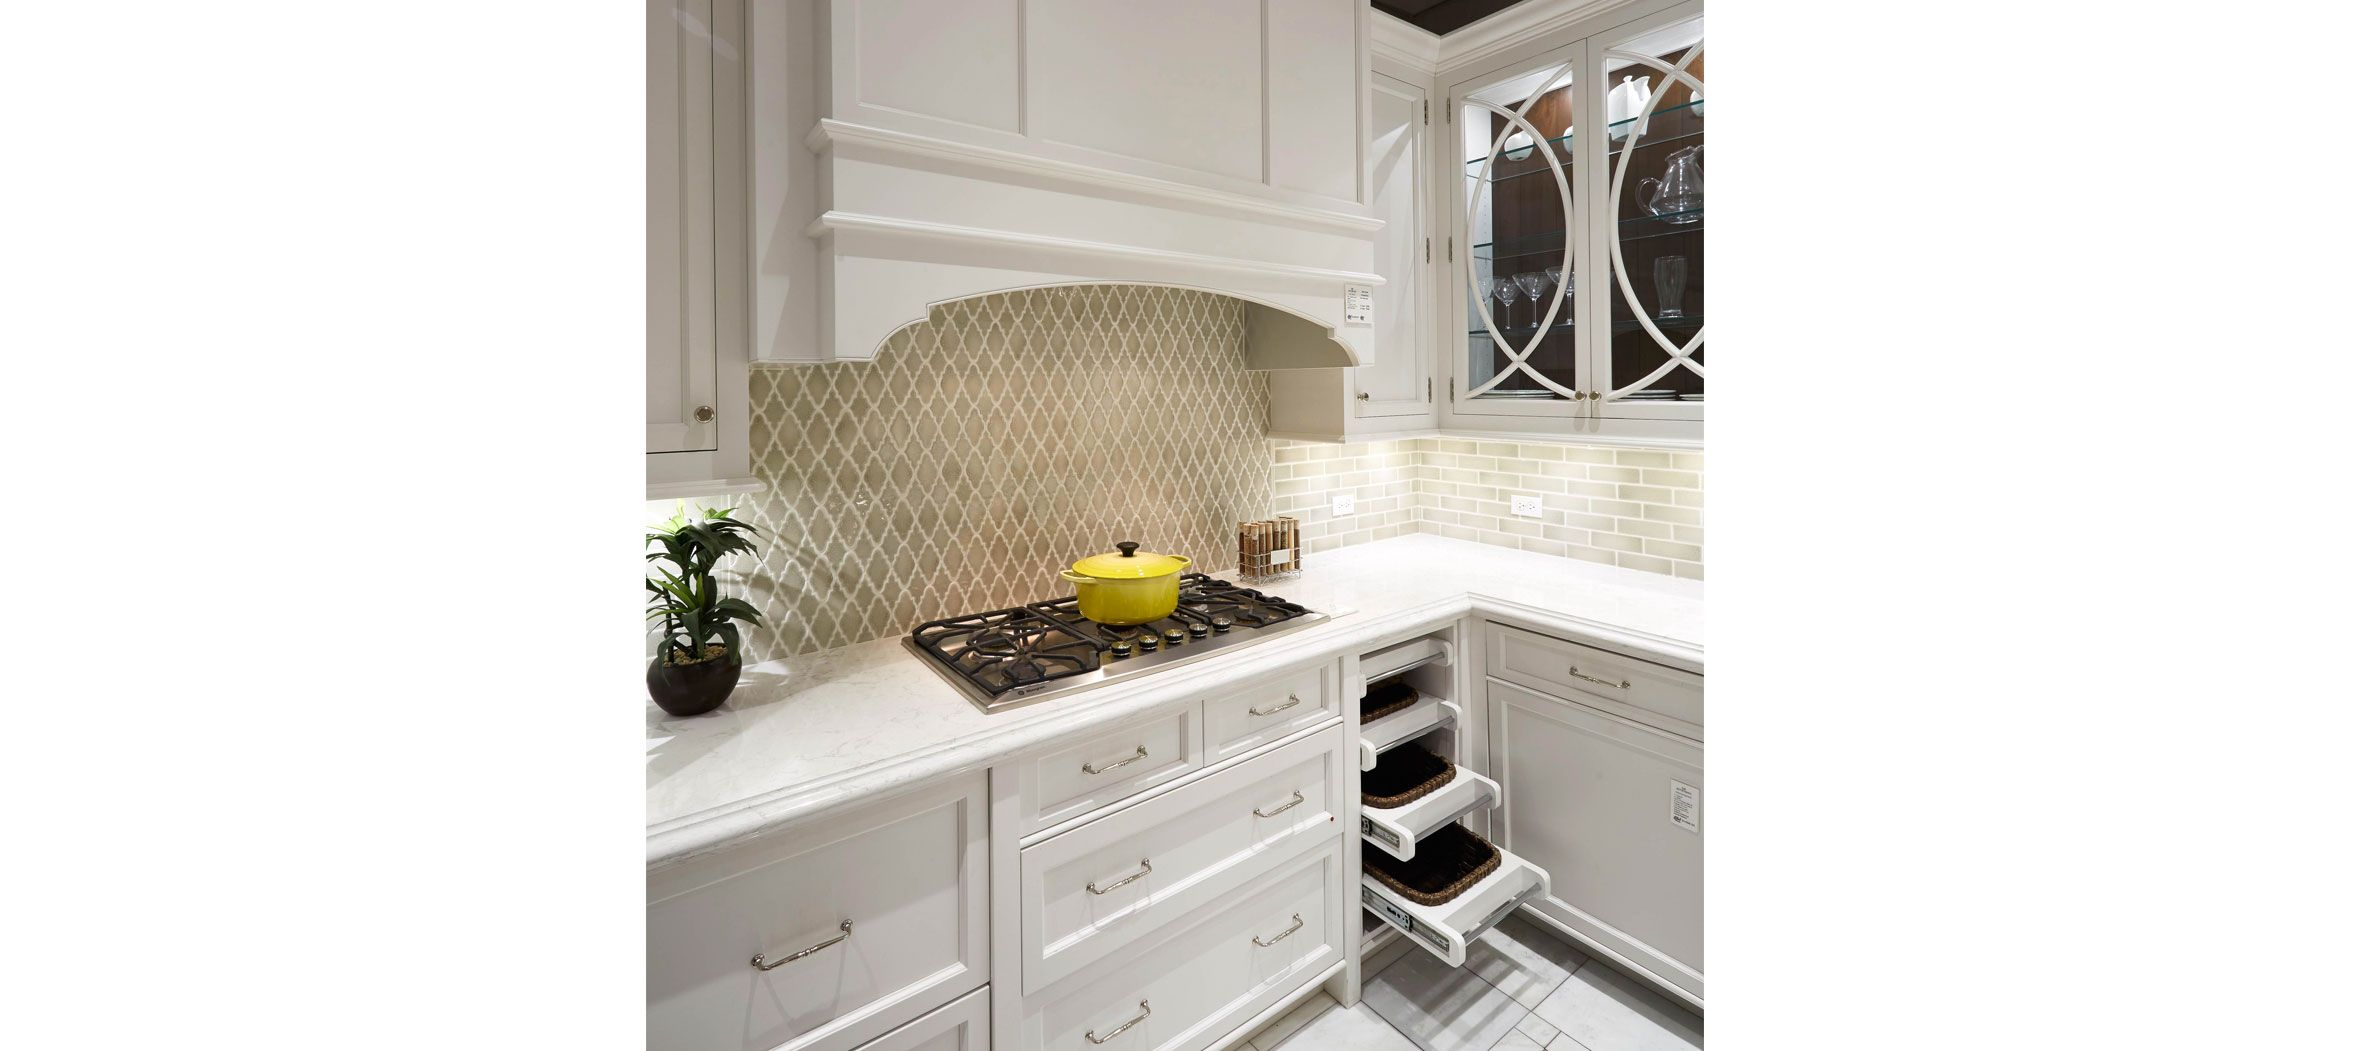 Abt Appliance Showroom Kitchen Pictures Monogram